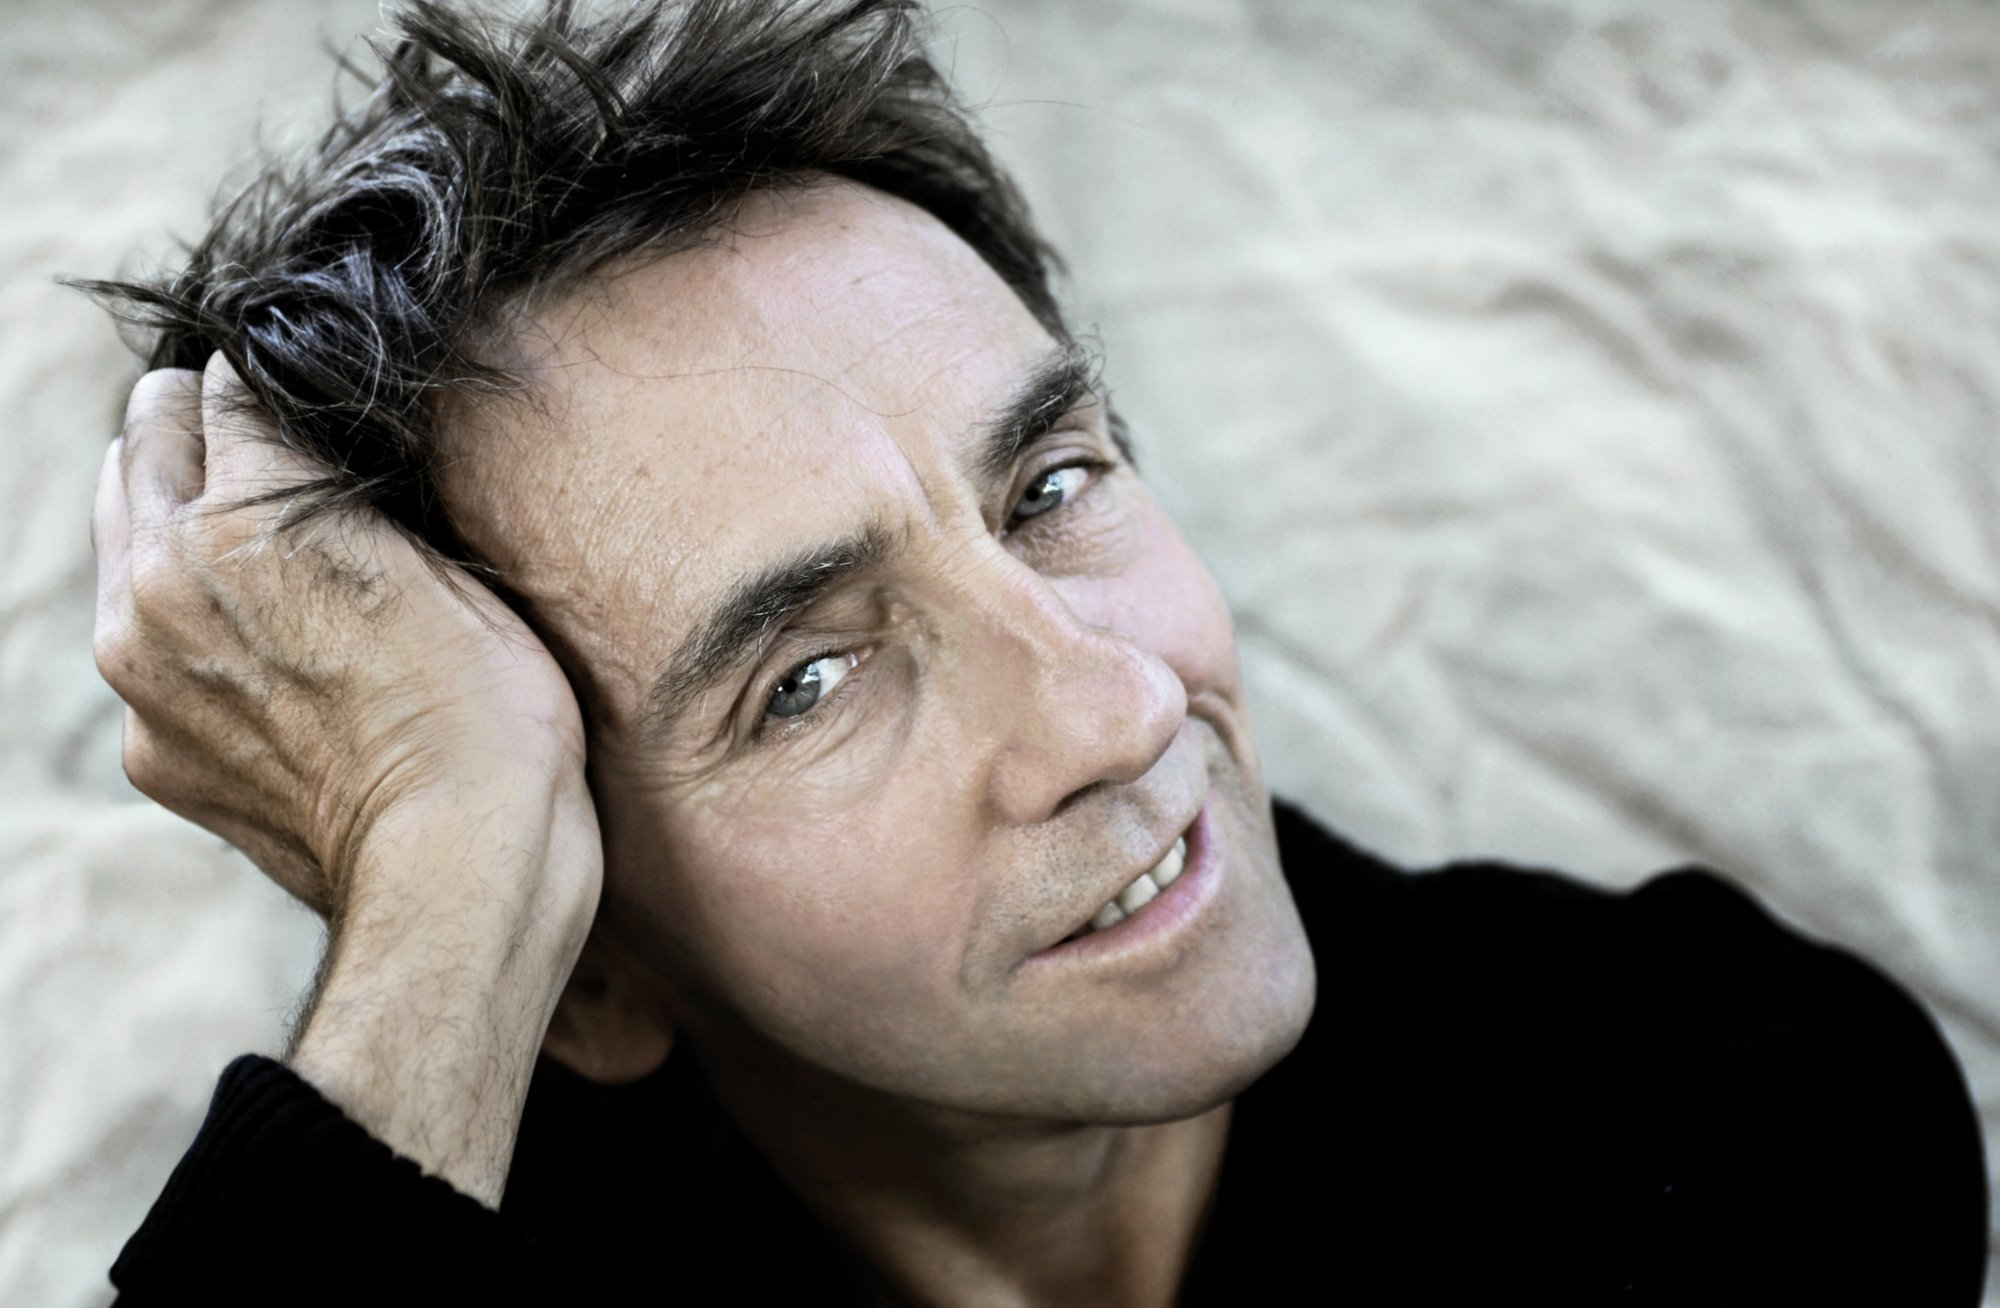 Pierre-Paul Savoie 1955-2021